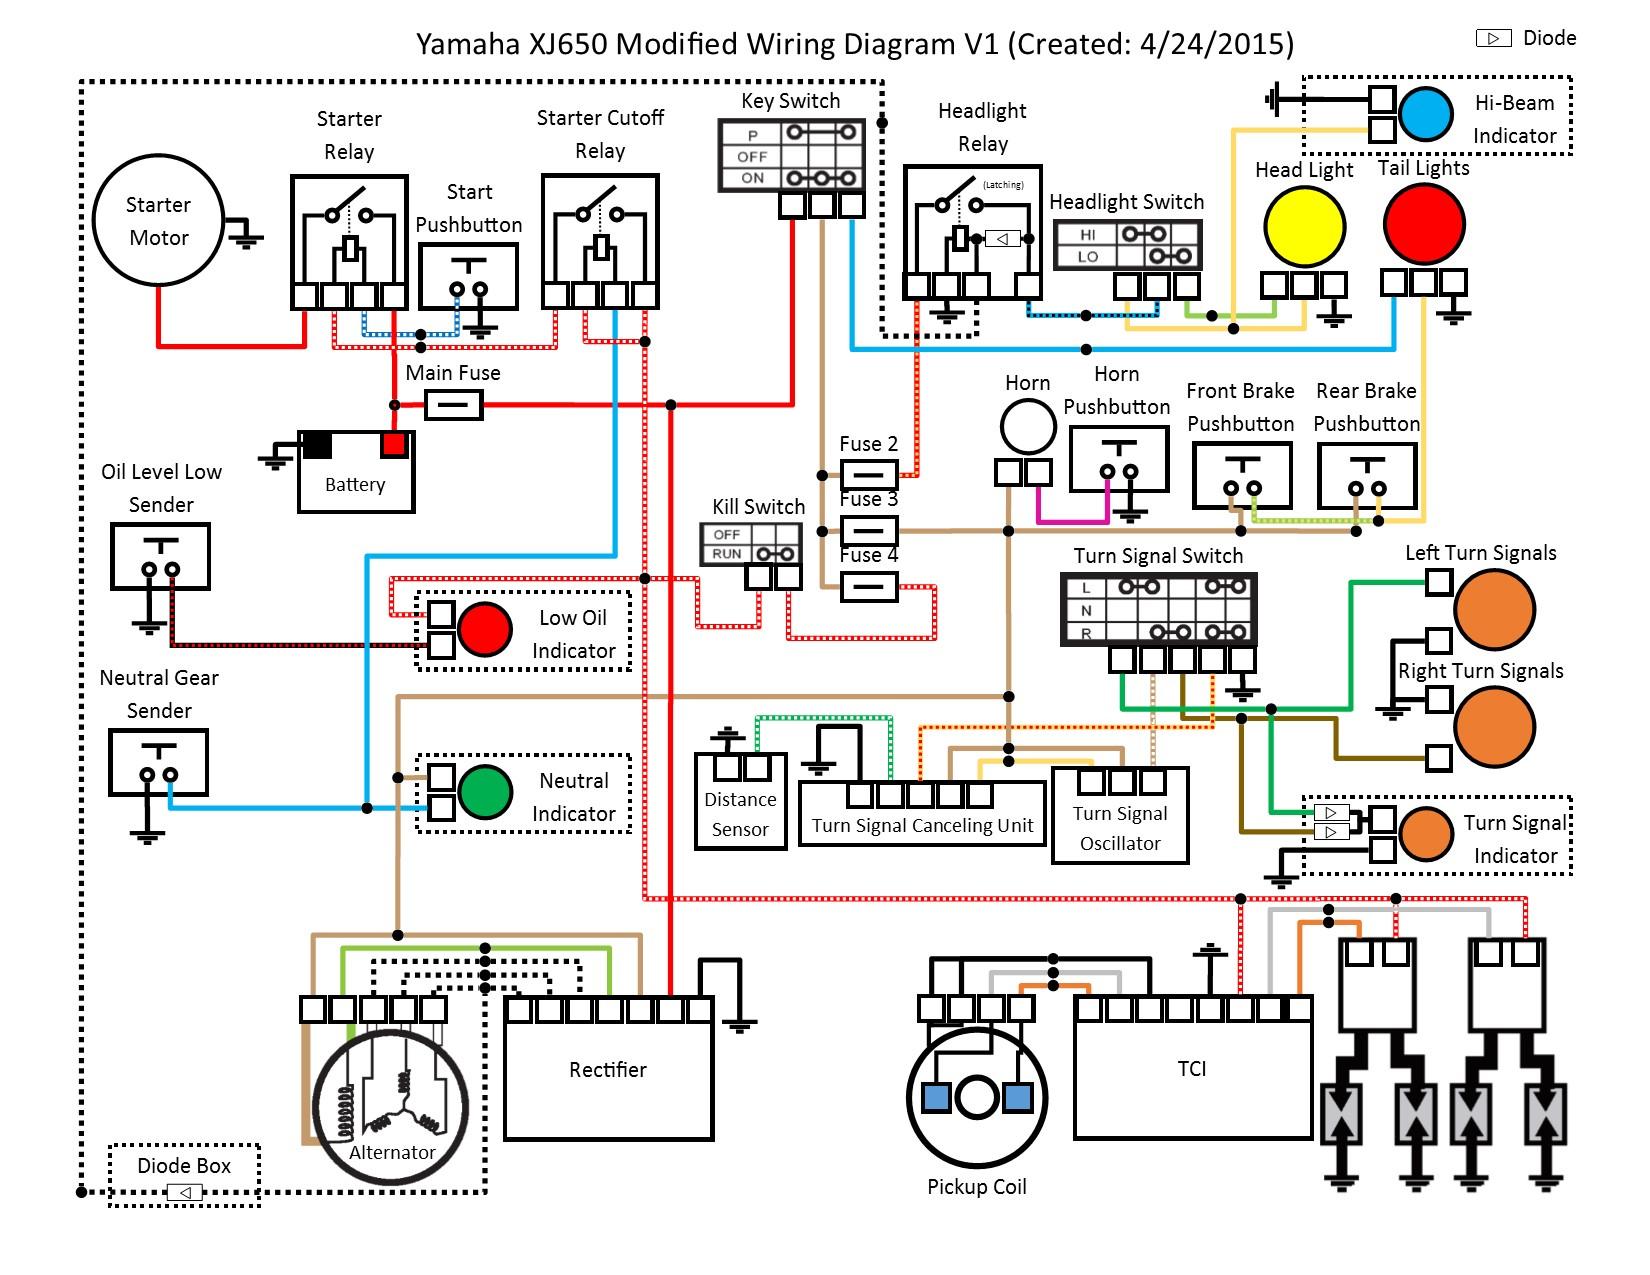 Na 6911 Wiring Diagram Home Electrical Wiring Diagram Software Free Download Wiring Diagram